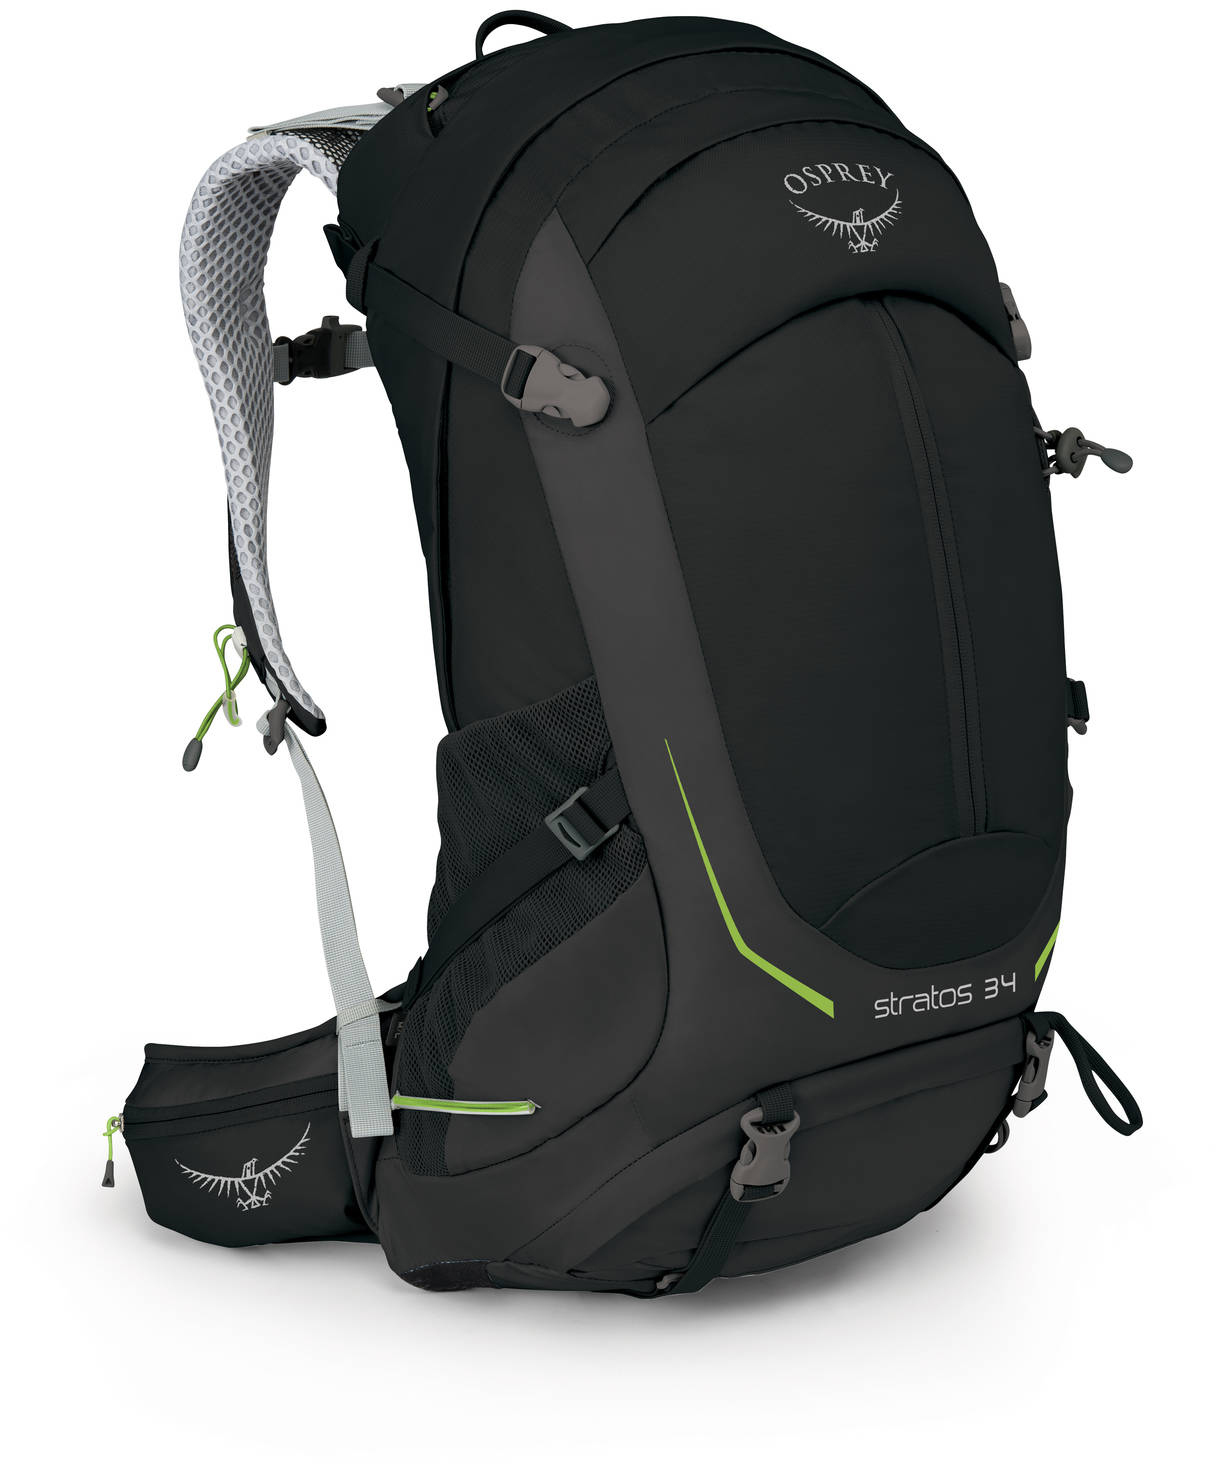 Туристические рюкзаки Рюкзак туристический Osprey Stratos 34 Stratos_34_S17_Side_Black_web.jpg